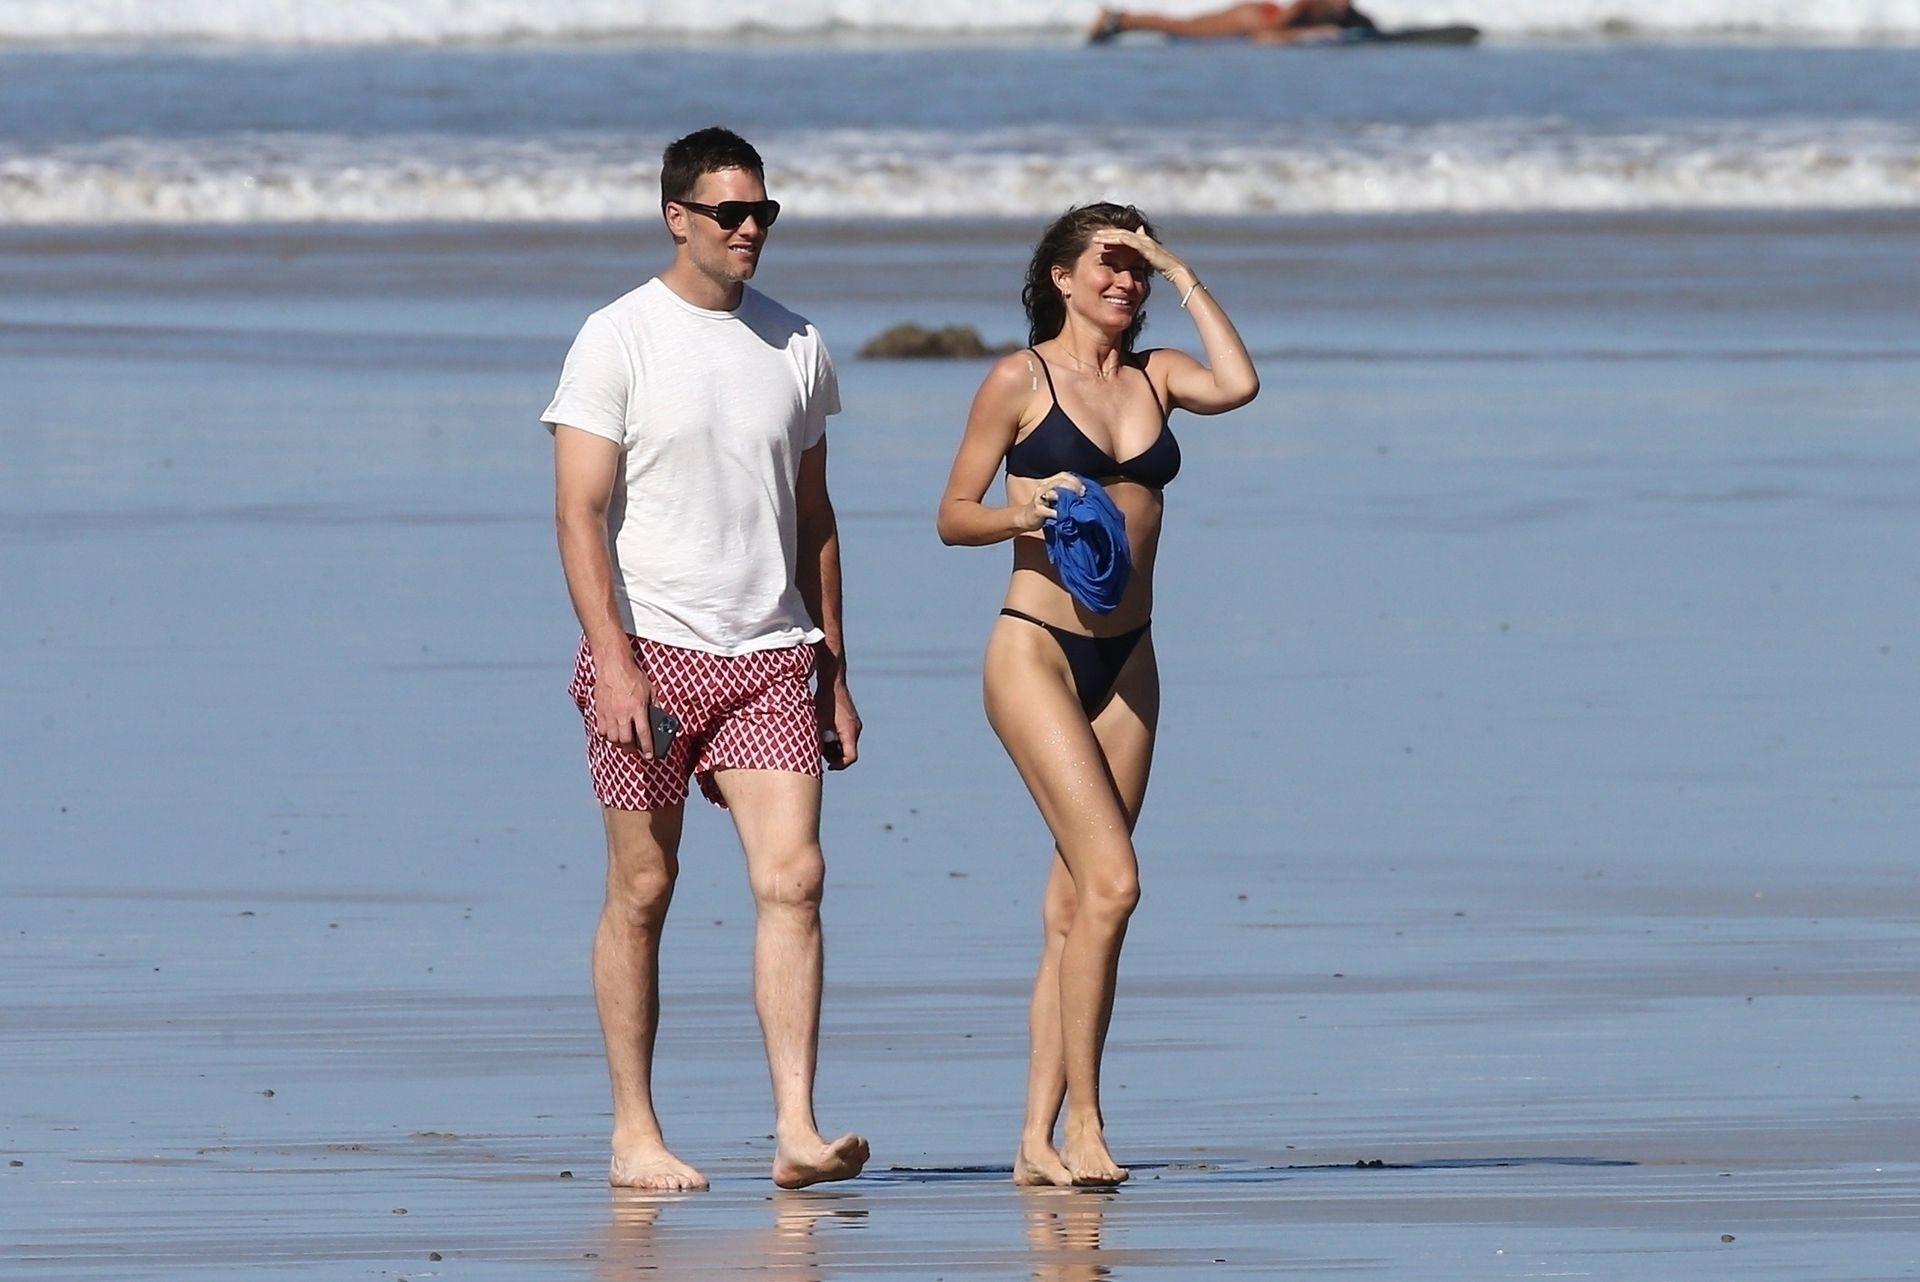 Tom Brady & Gisele Bundchen Pack On The Pda At The Beach 0007